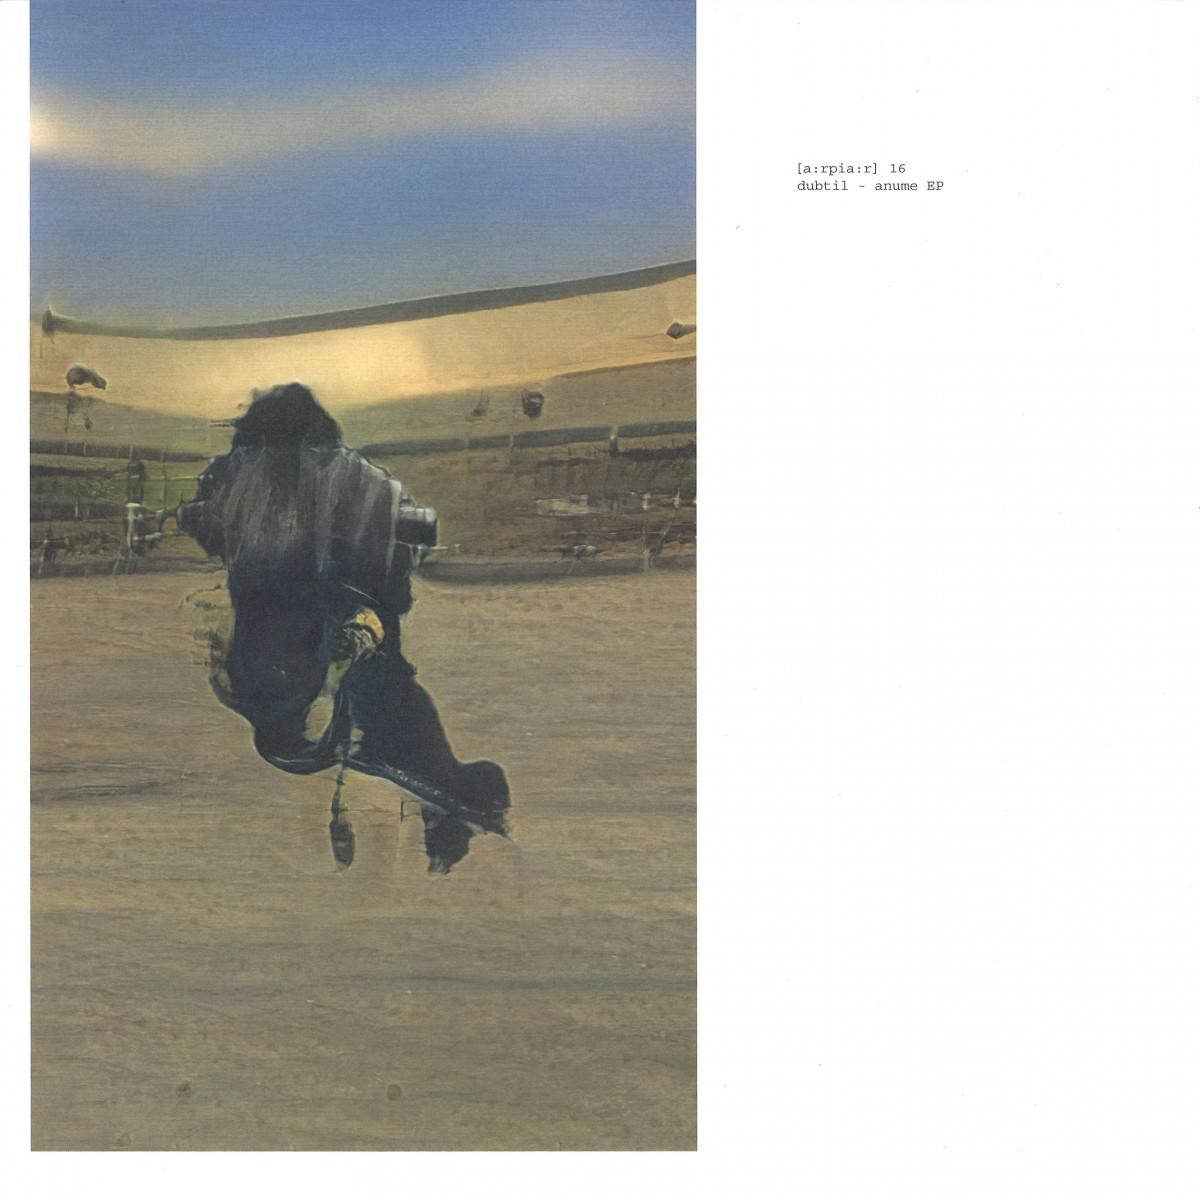 Dubtil - Anume EP [Arpiar] 01